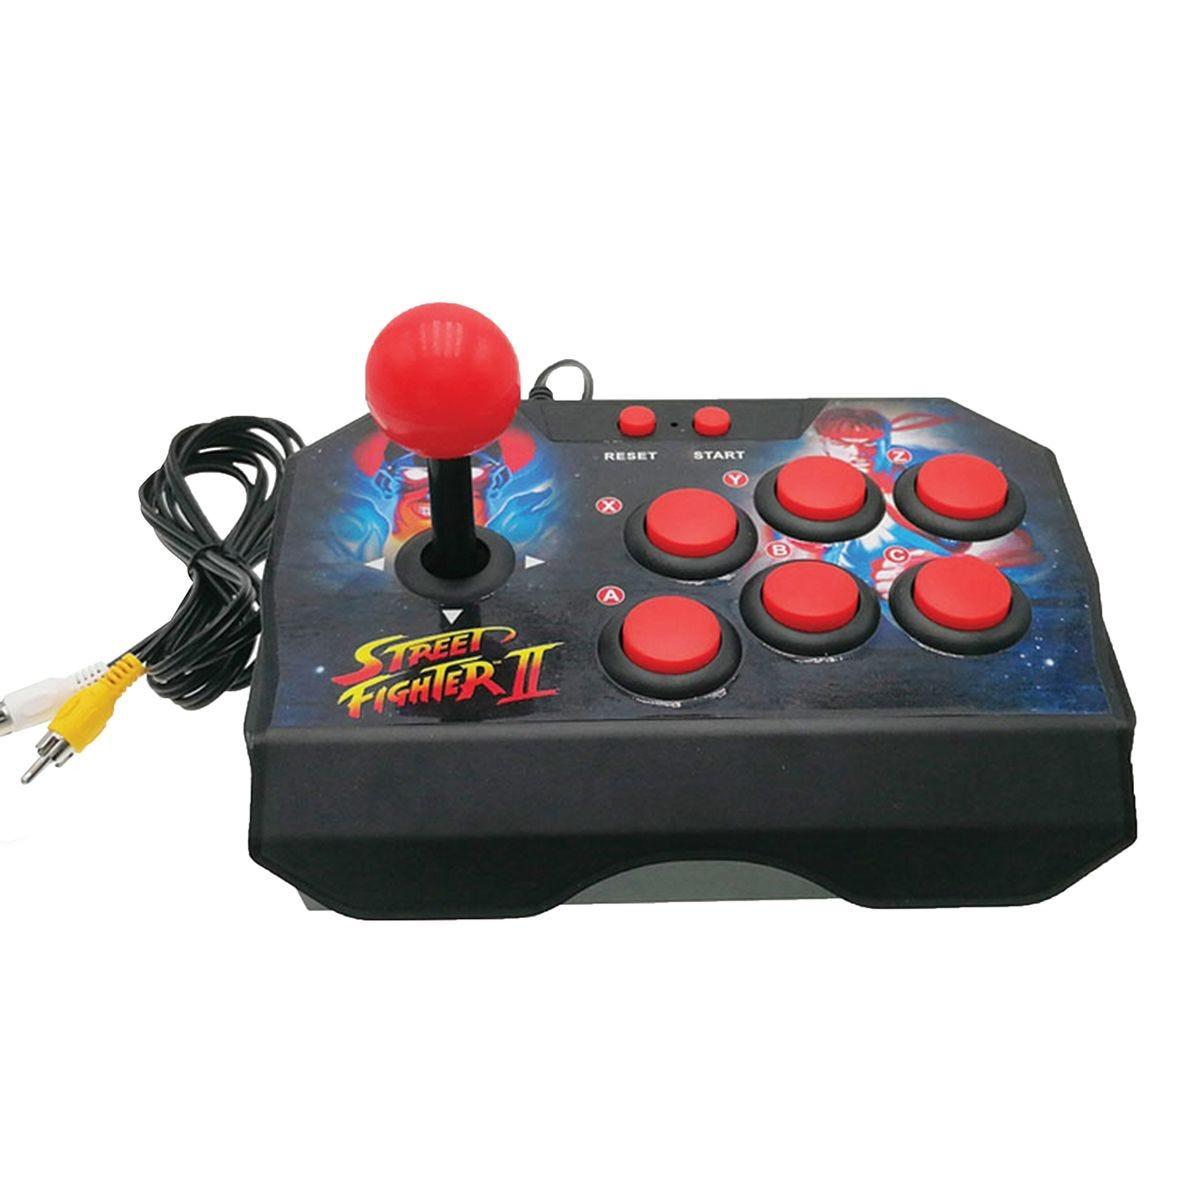 Capcom 16 Bit Streetfighter 2 Gaming Console